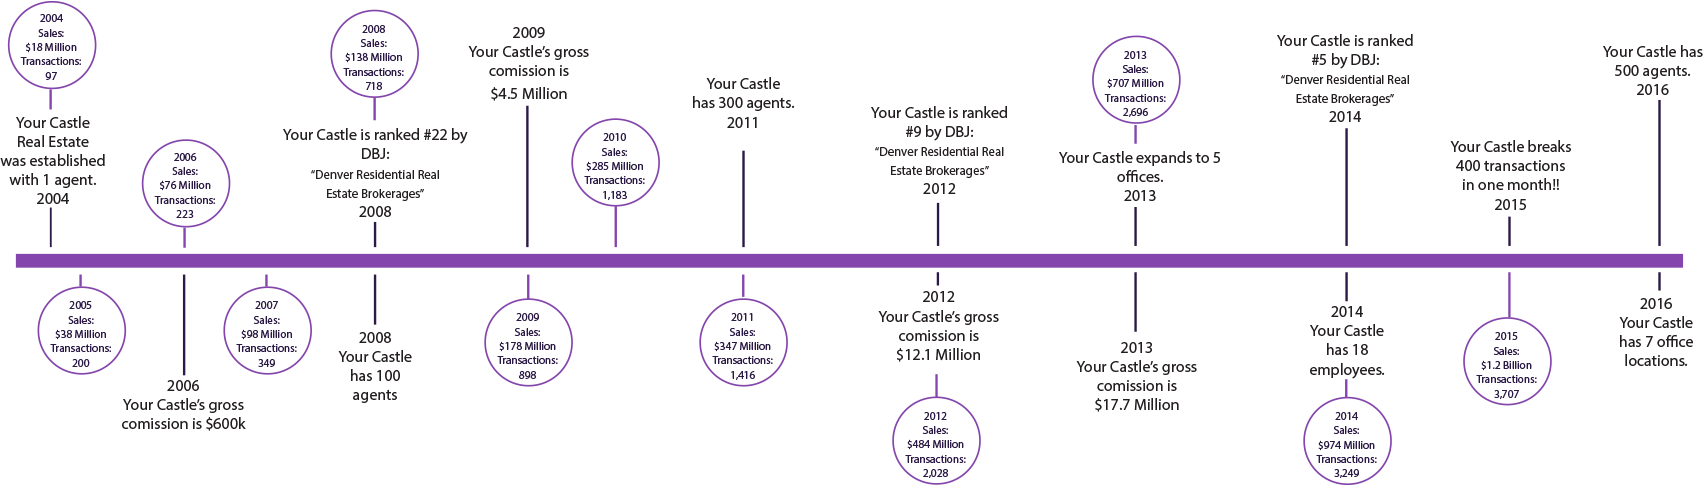 layered timeline Careers